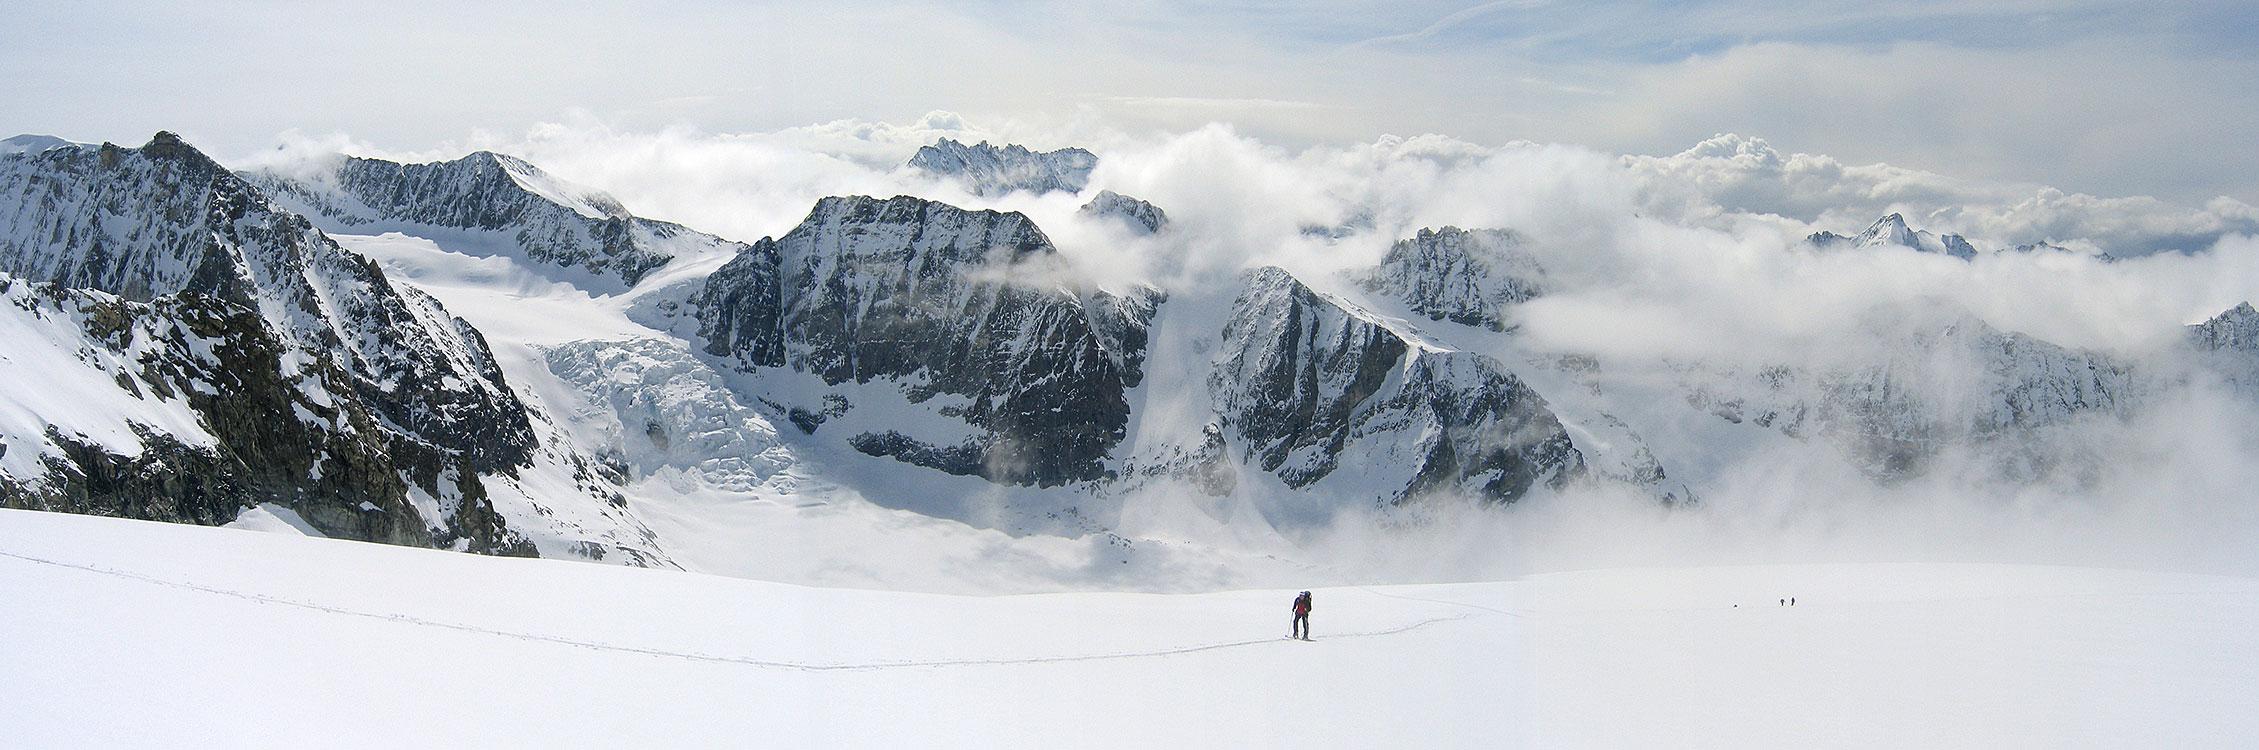 La Ruinette Walliser Alpen / Alpes valaisannes Schweiz panorama 37